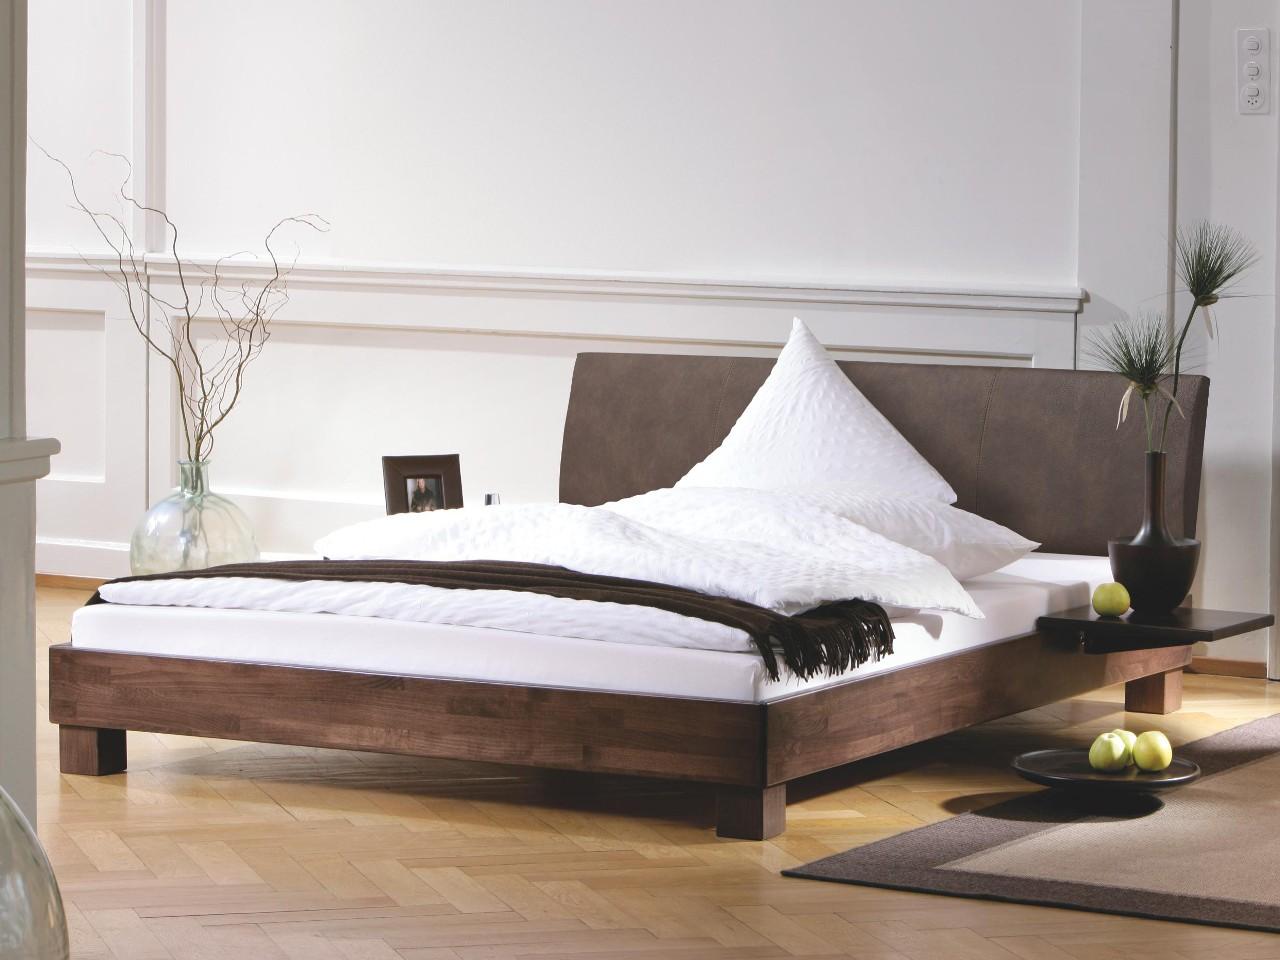 bett 100x200 kernbuche preisvergleiche. Black Bedroom Furniture Sets. Home Design Ideas